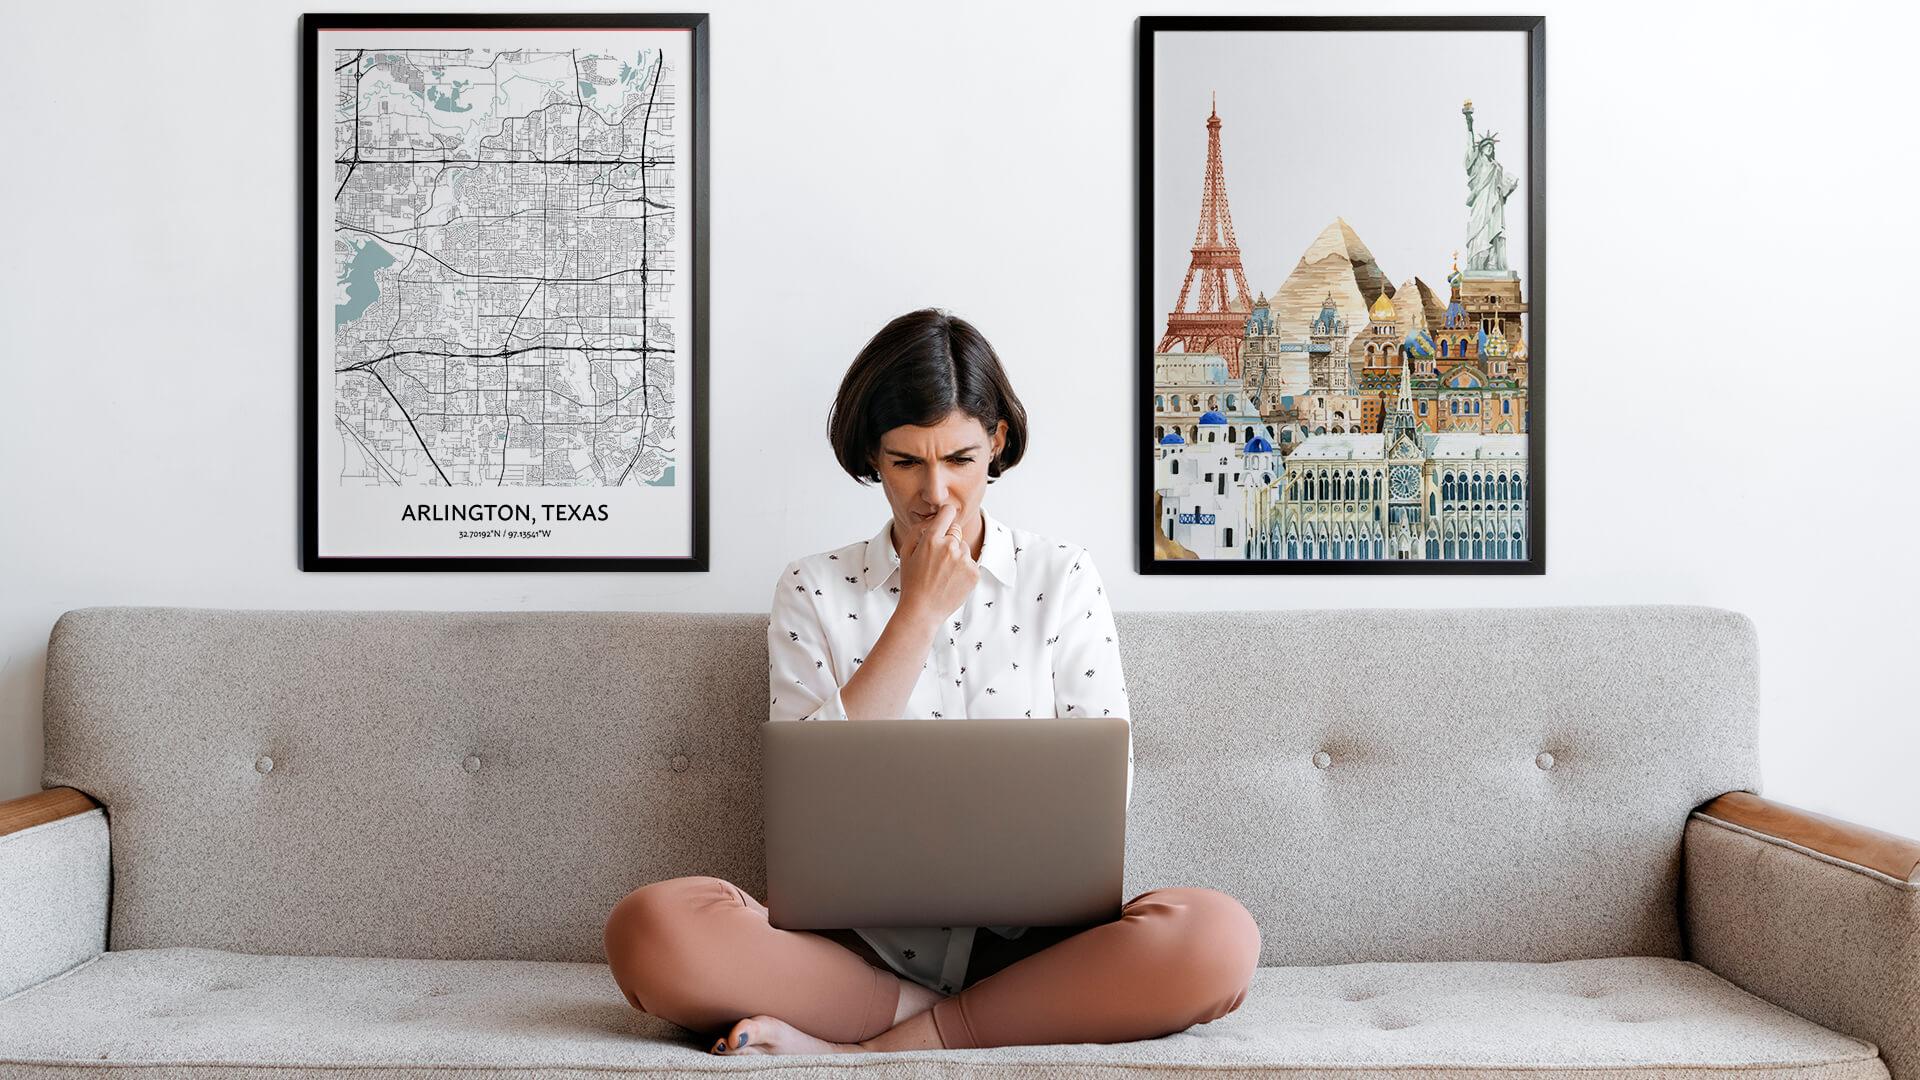 Arlington Texas city map art